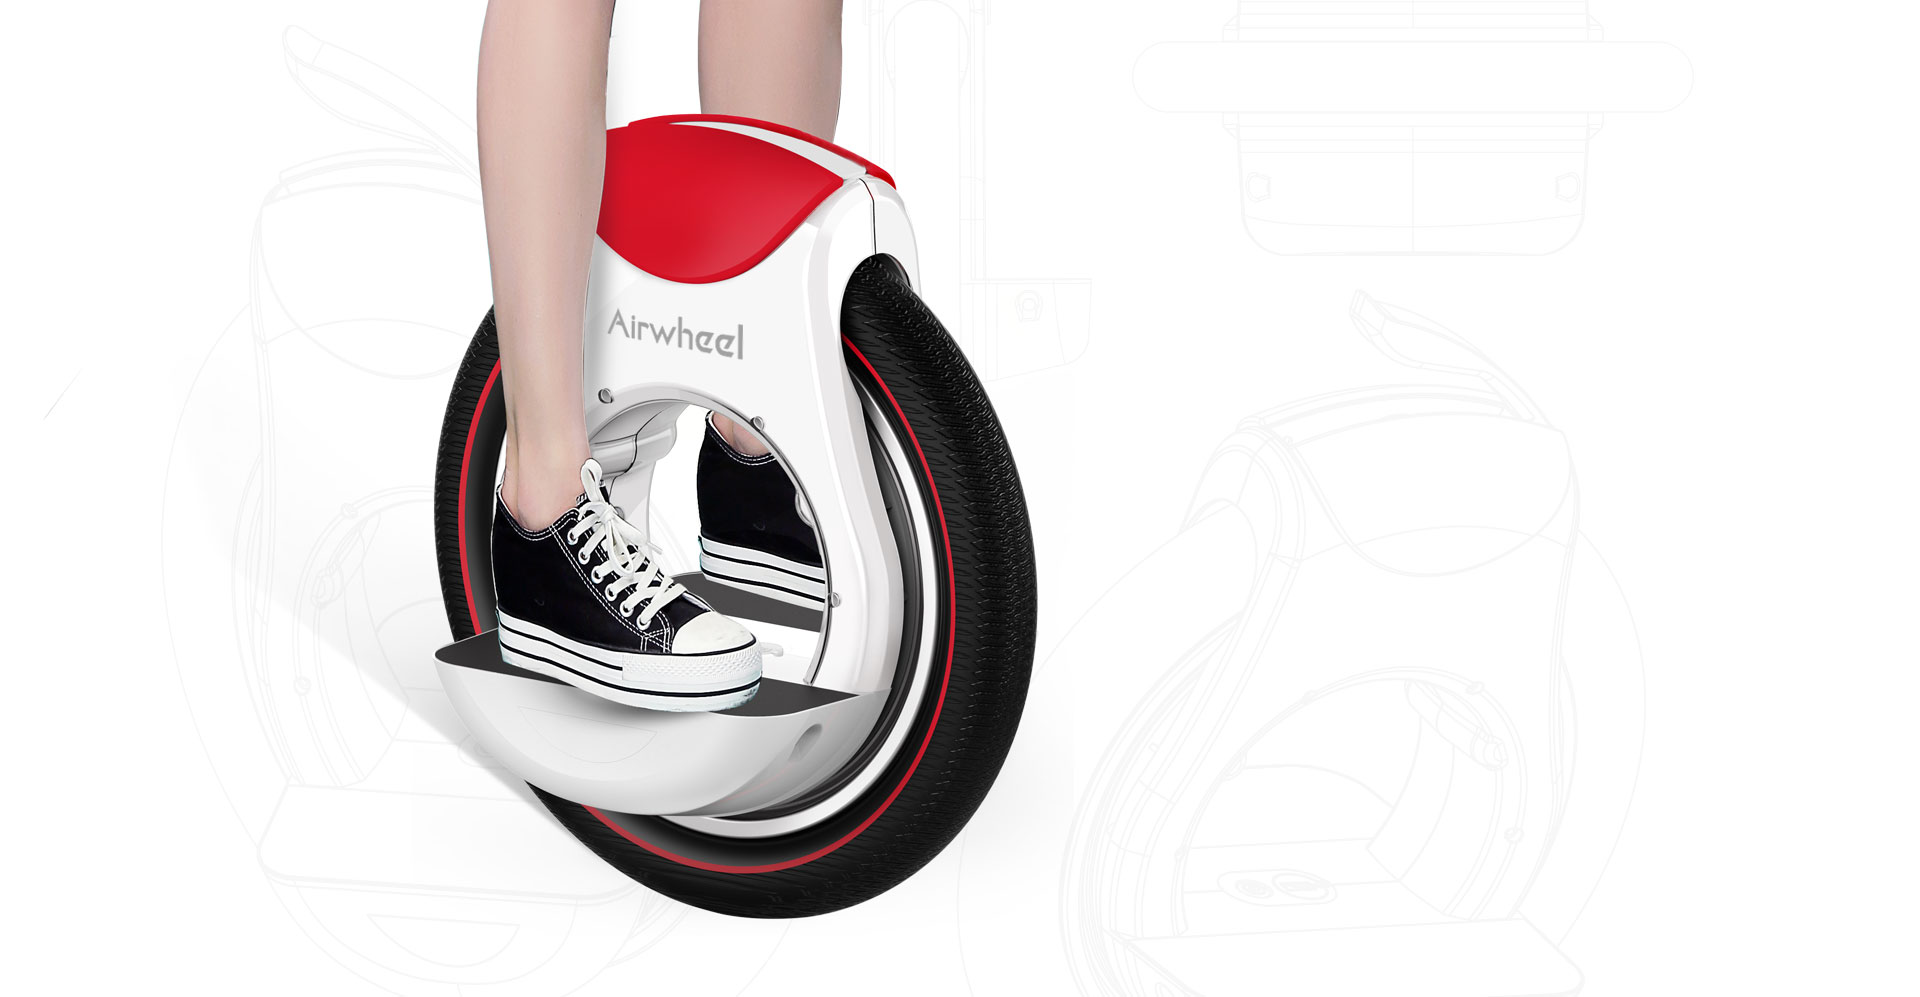 Airwheel F3